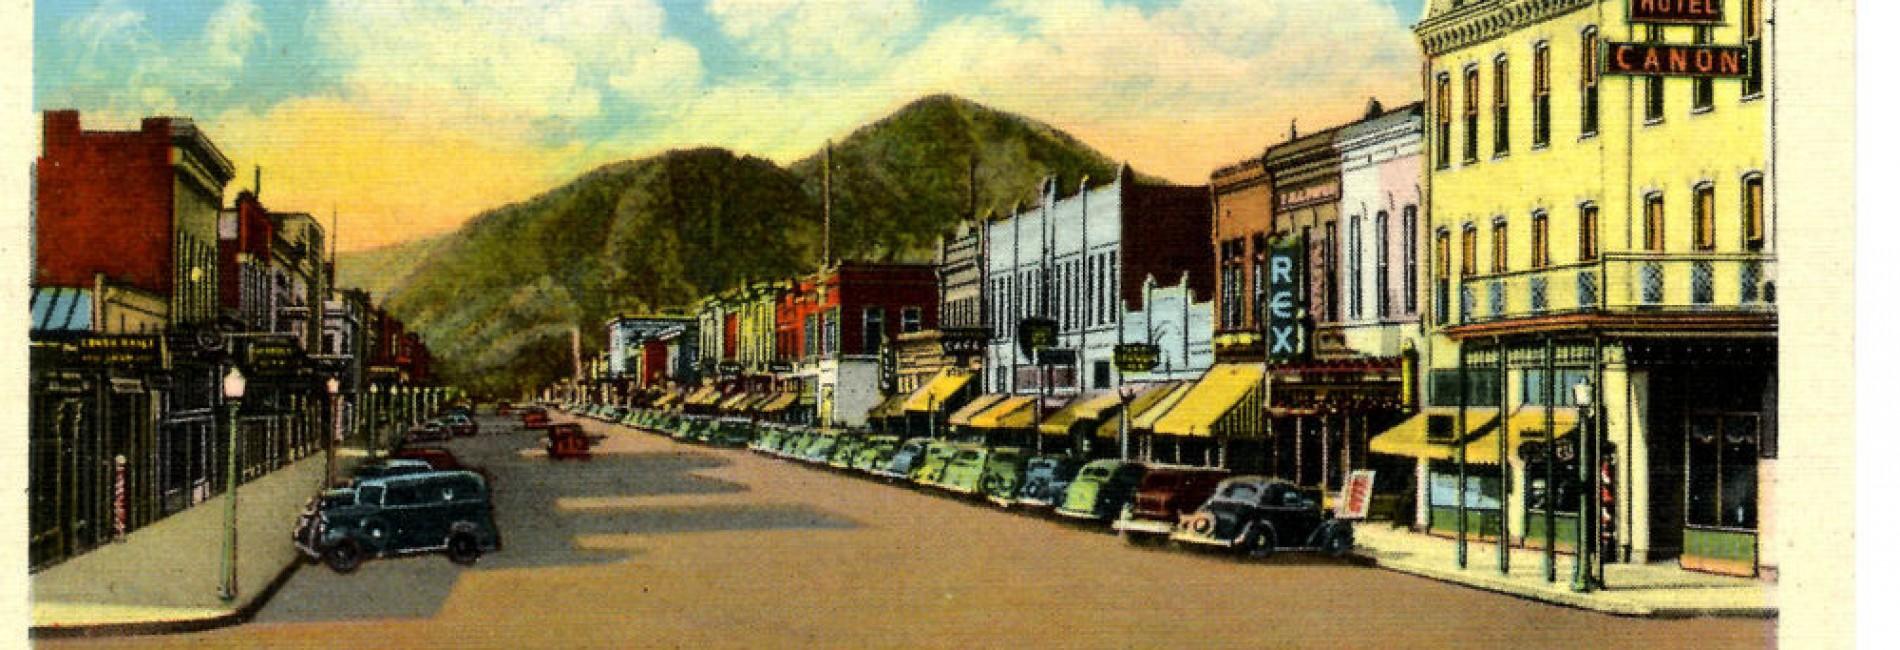 canon city postcard